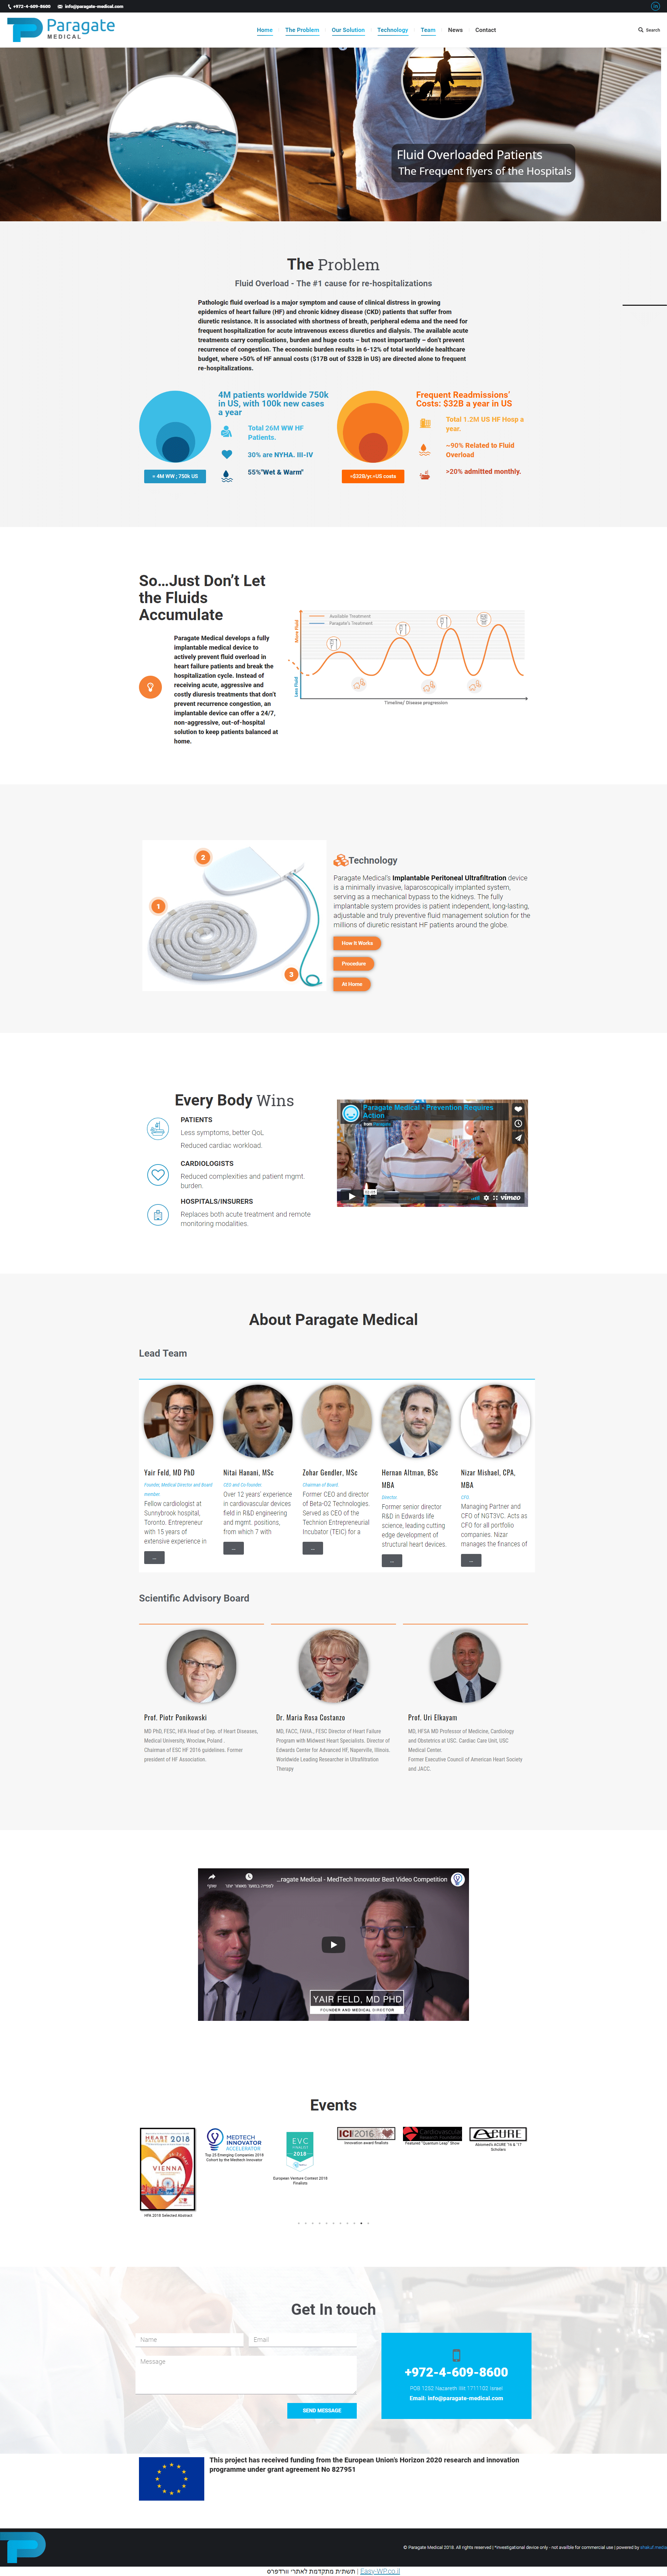 1paragate-medical.com